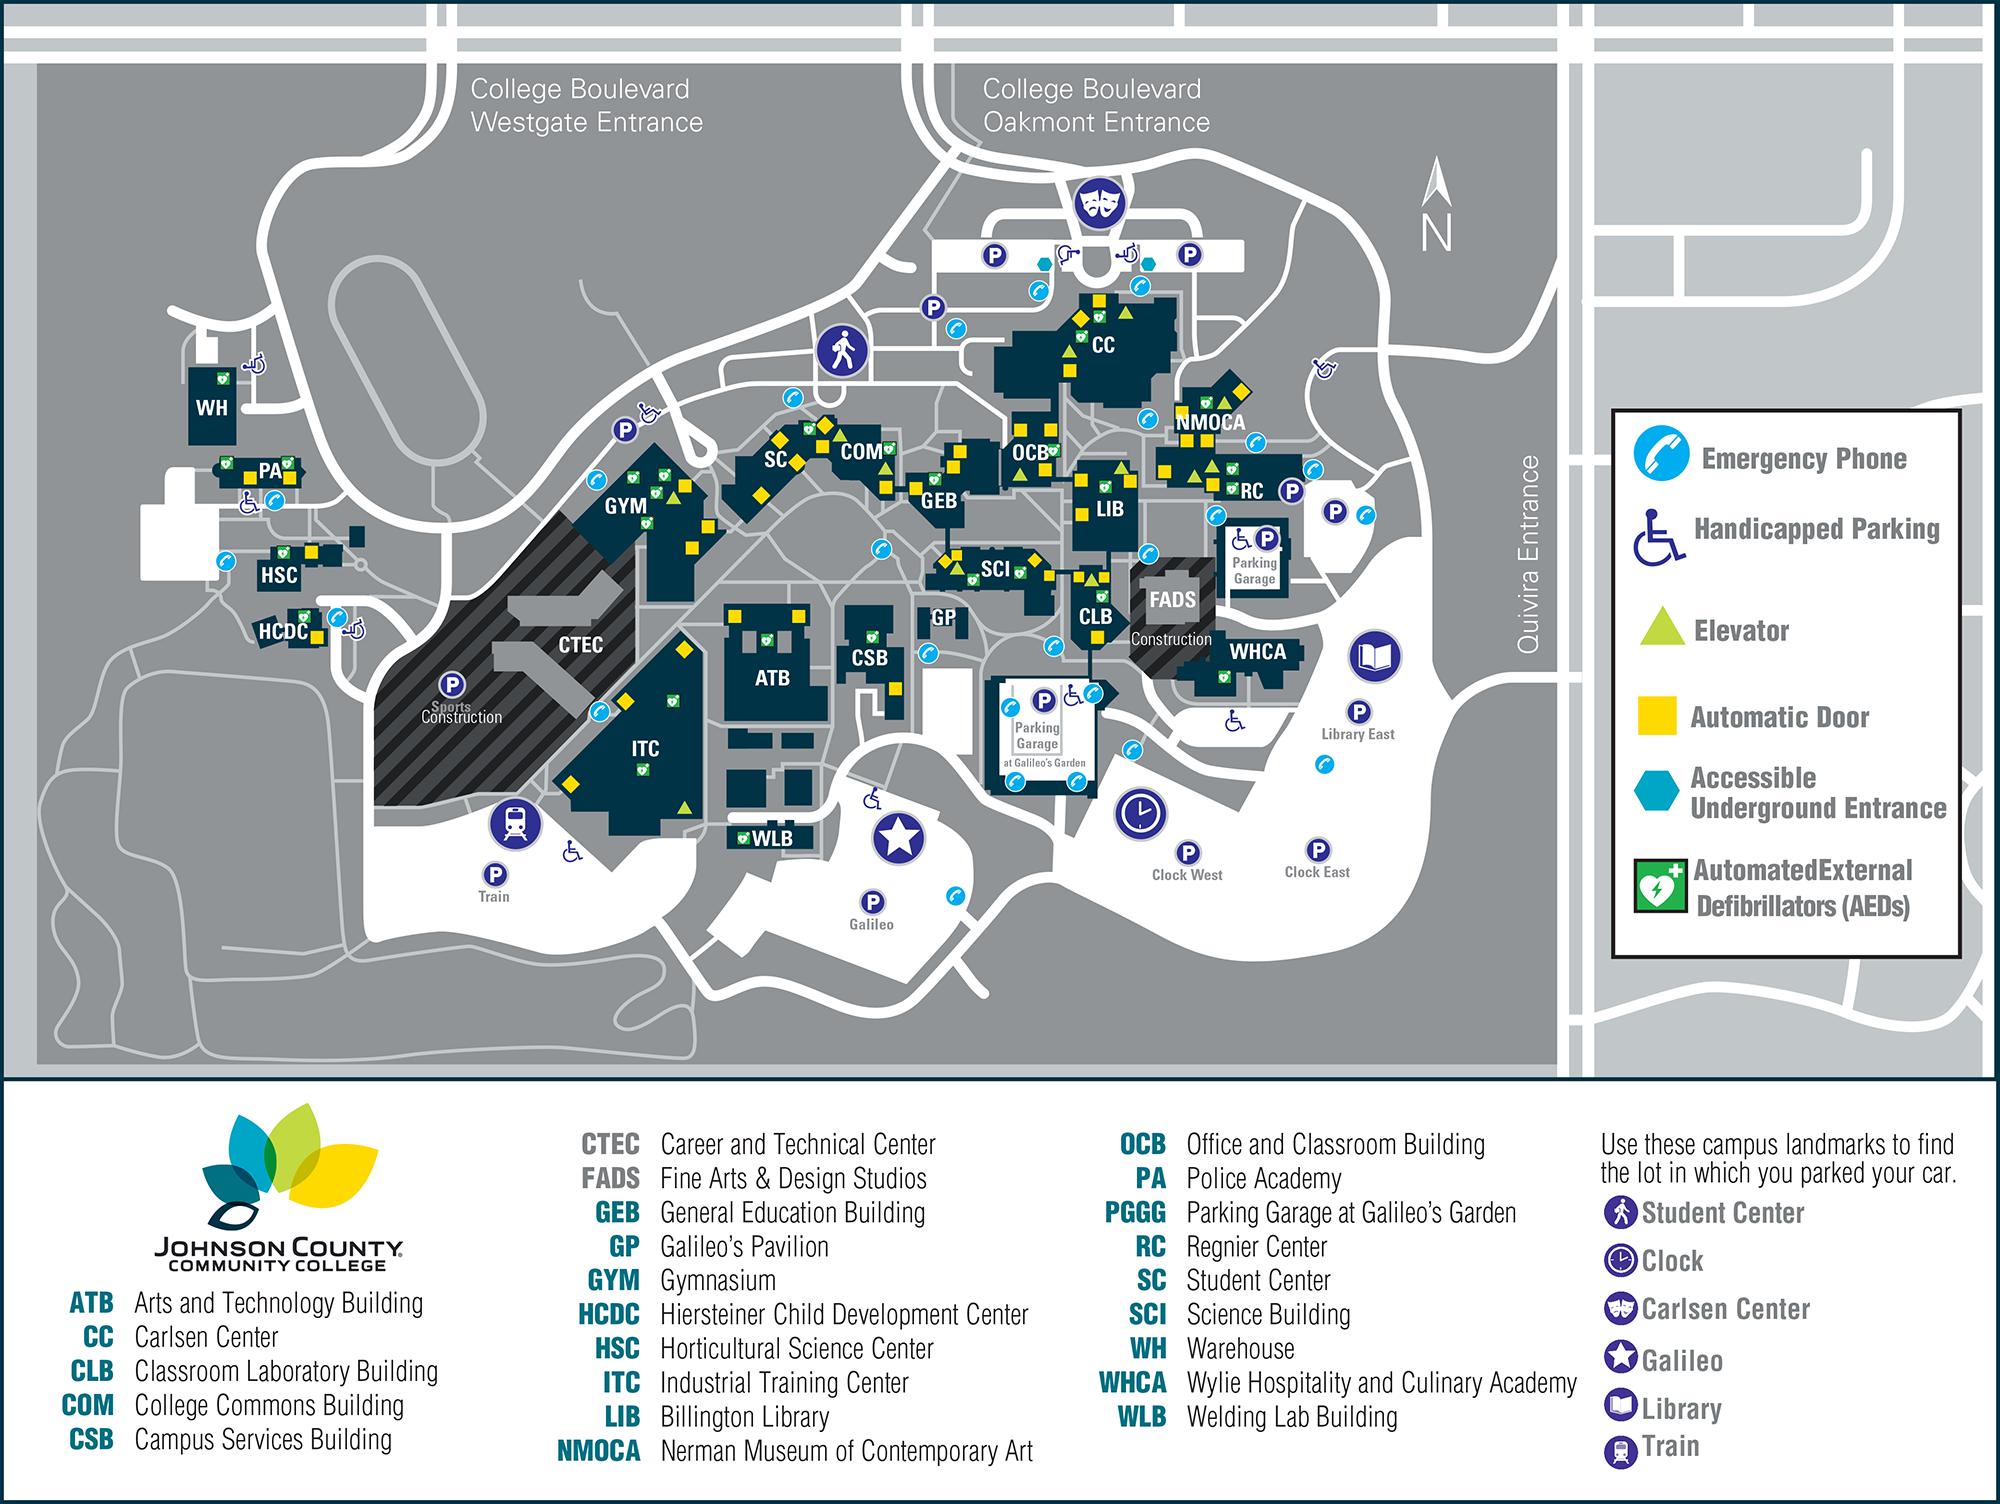 Jccc Campus Map Johnson County Community College Campus Map Jccc Campus Map